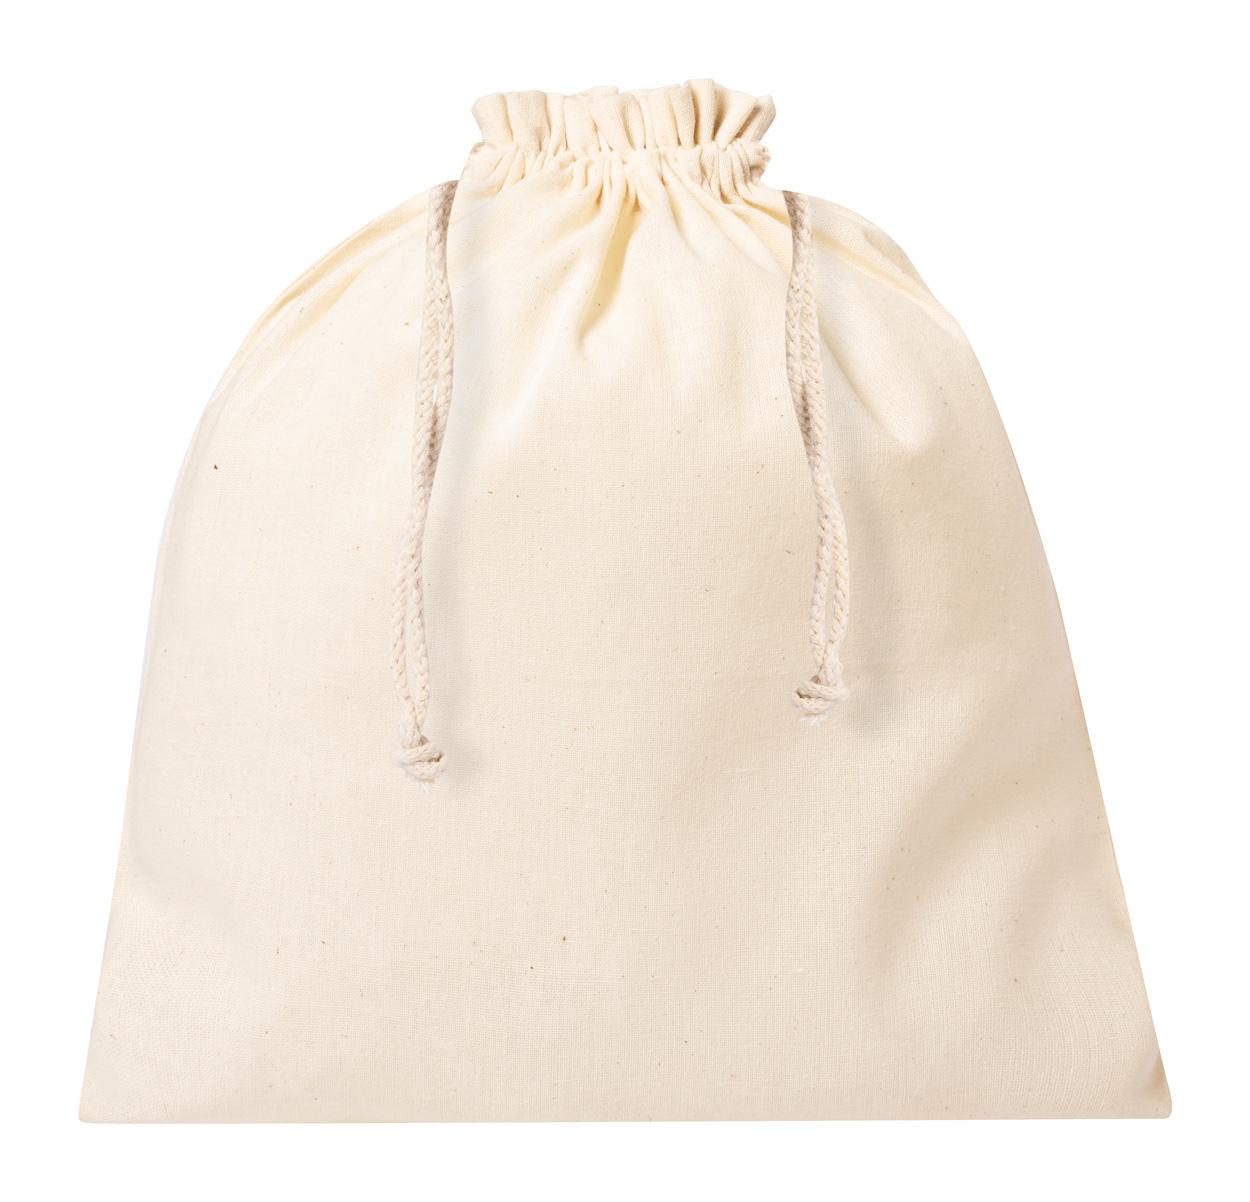 Jardix produce bag